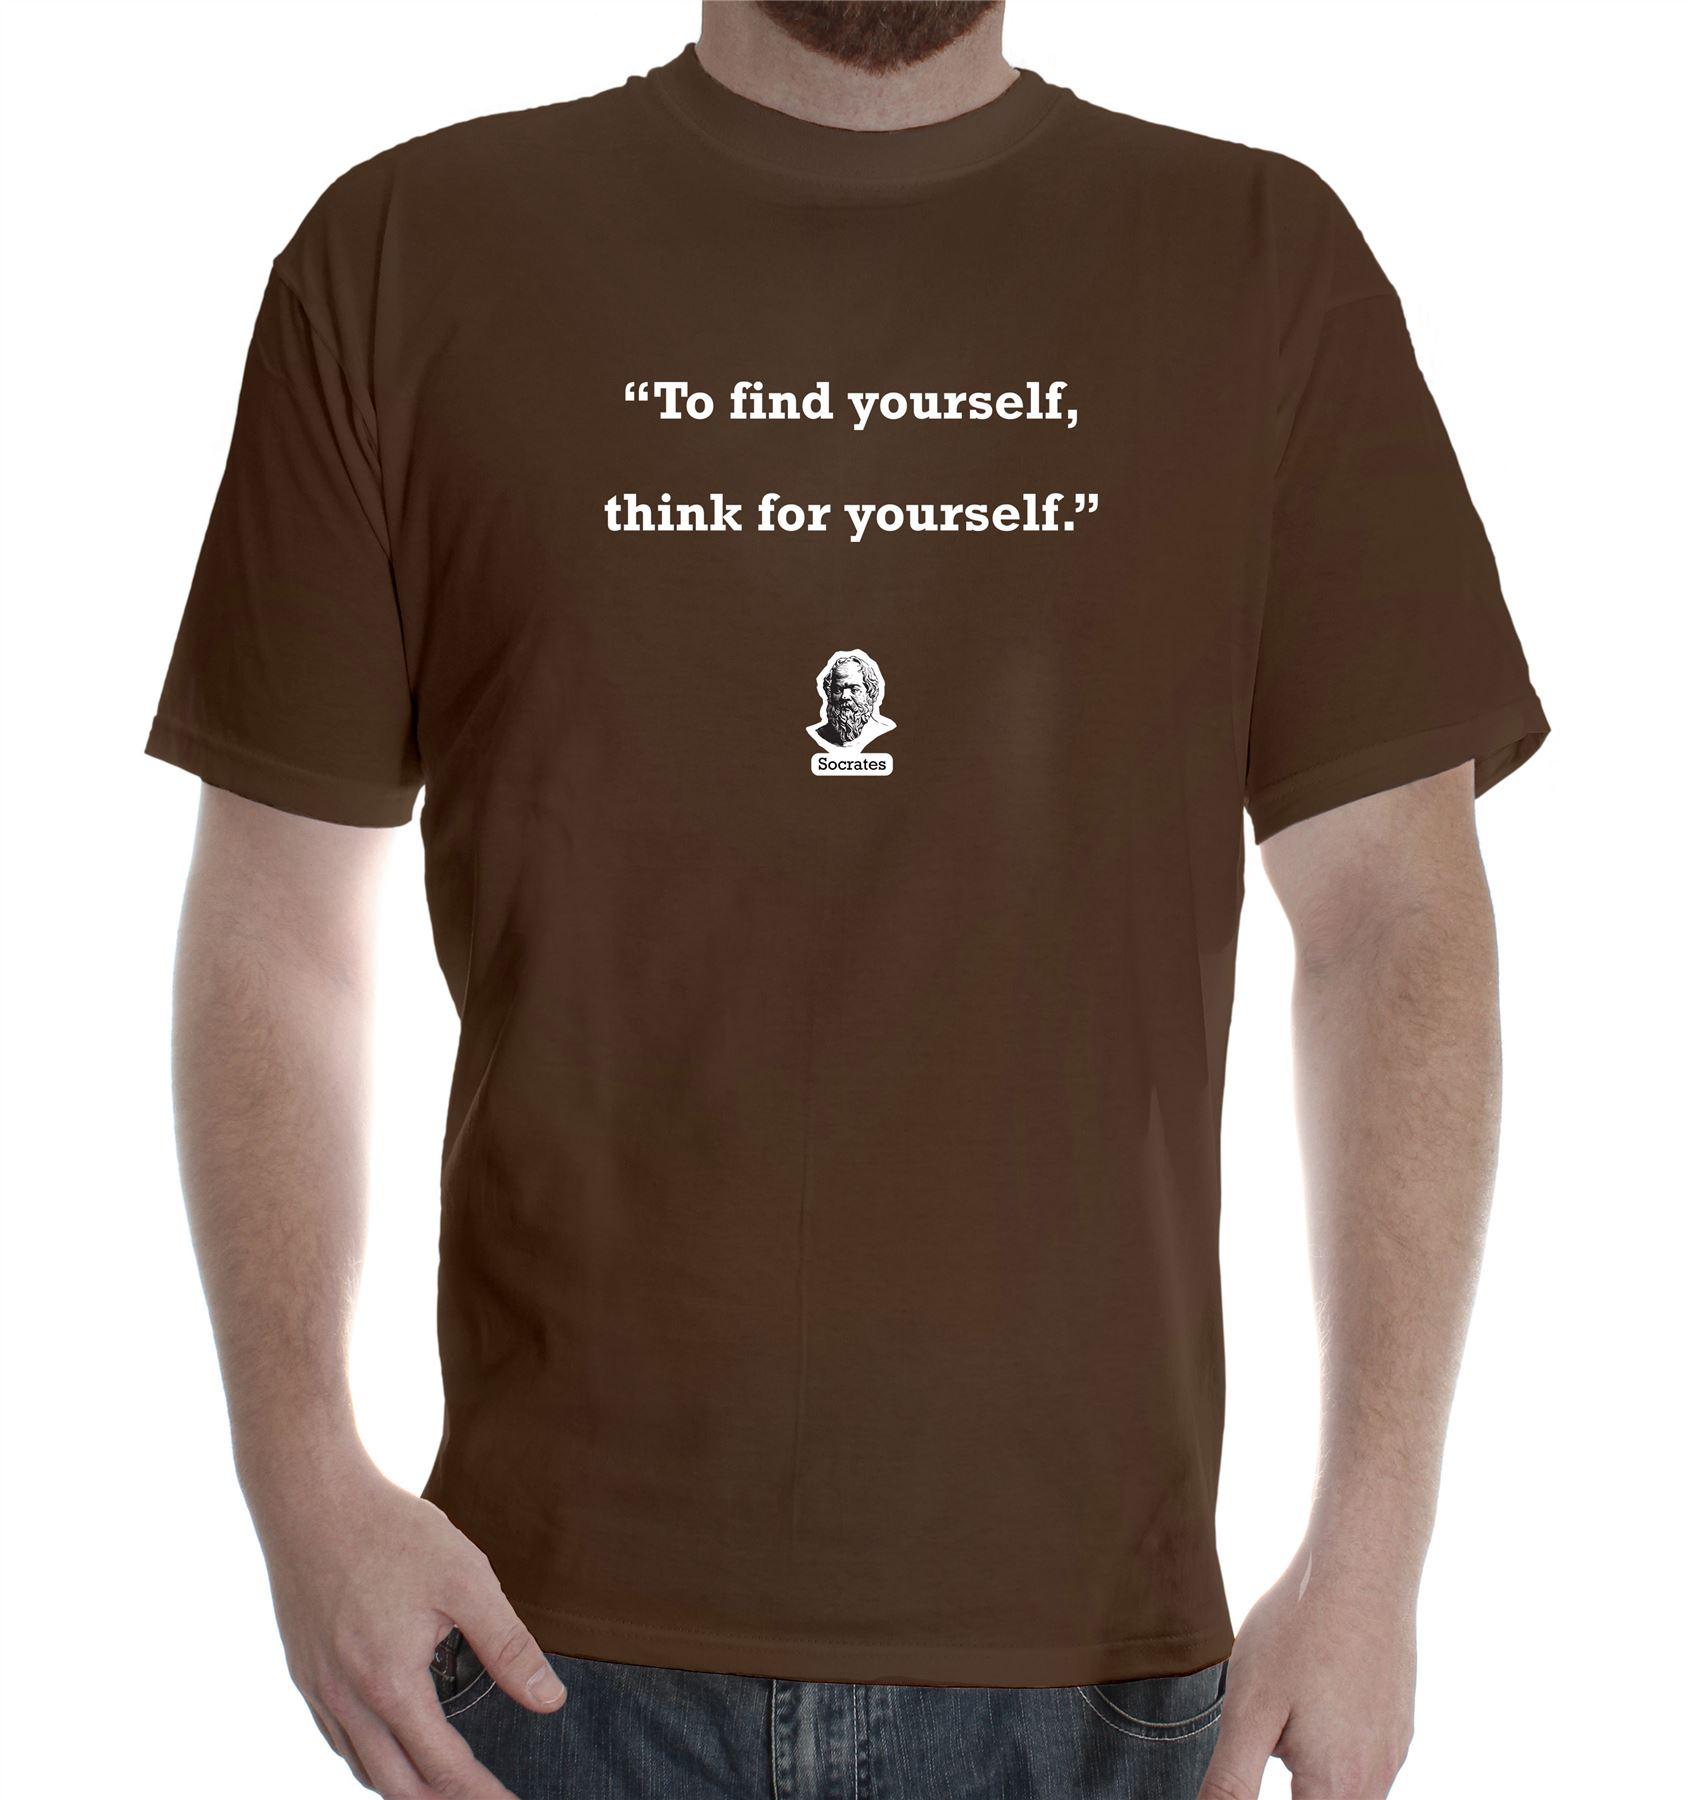 T shirt design yourself - Mens Printed Cotton T Shirt Tee Shirt Design